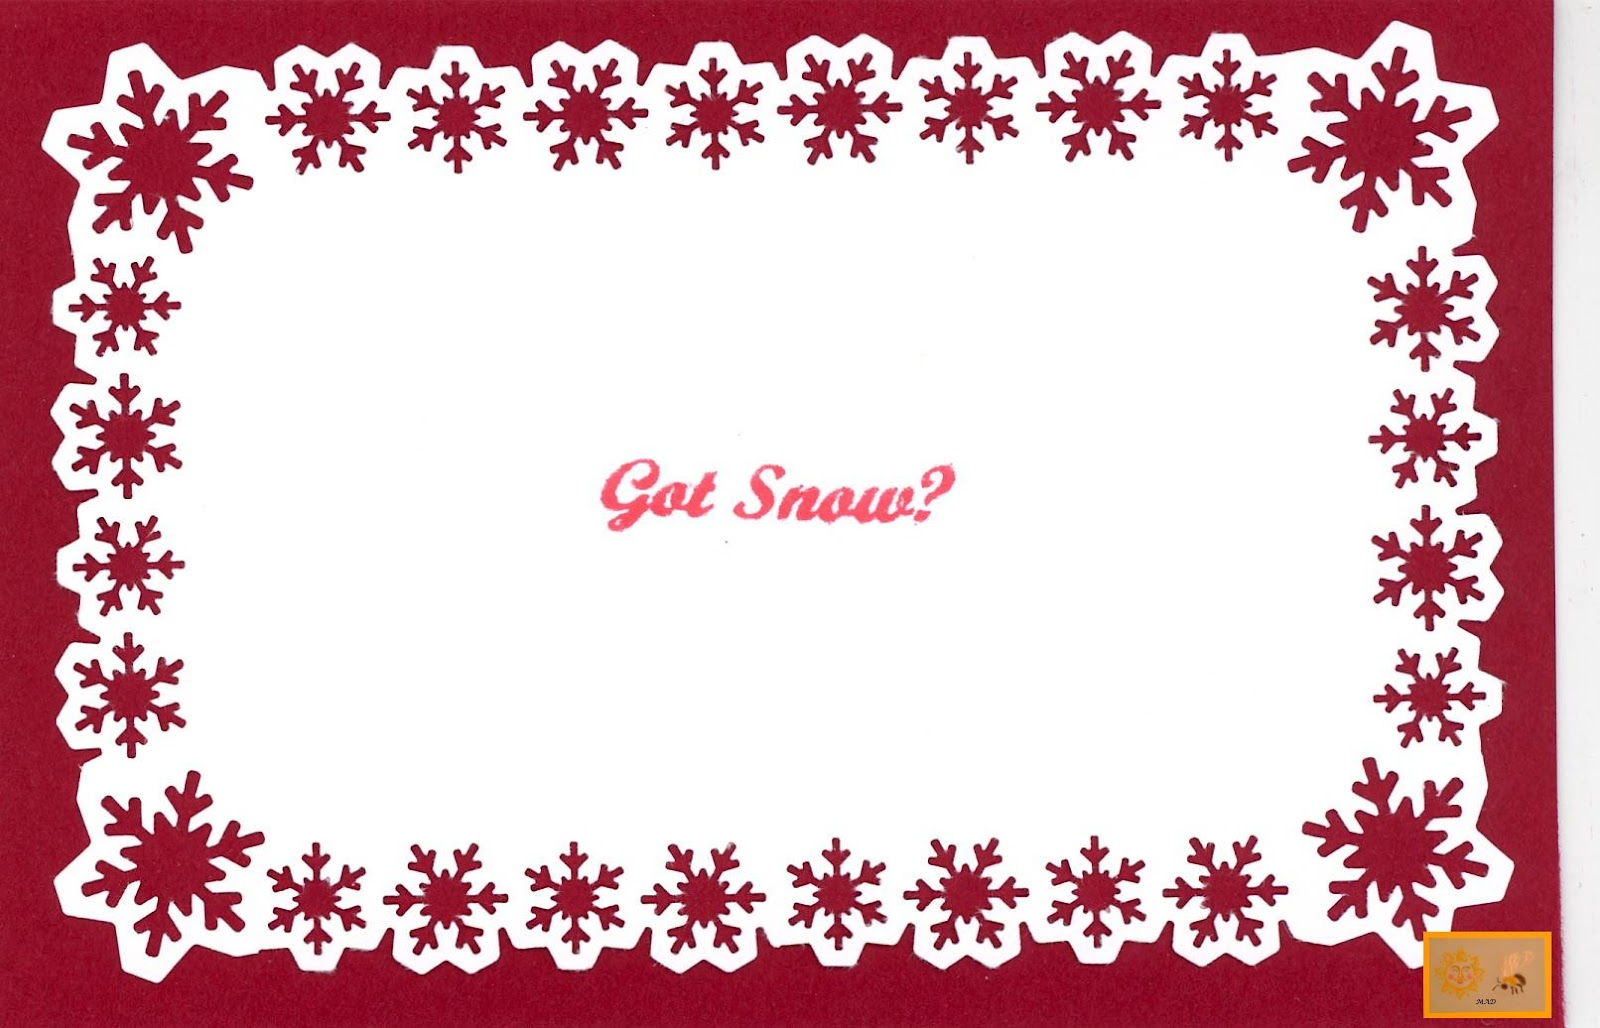 createdsunshine honeybee christmas snowflake border card